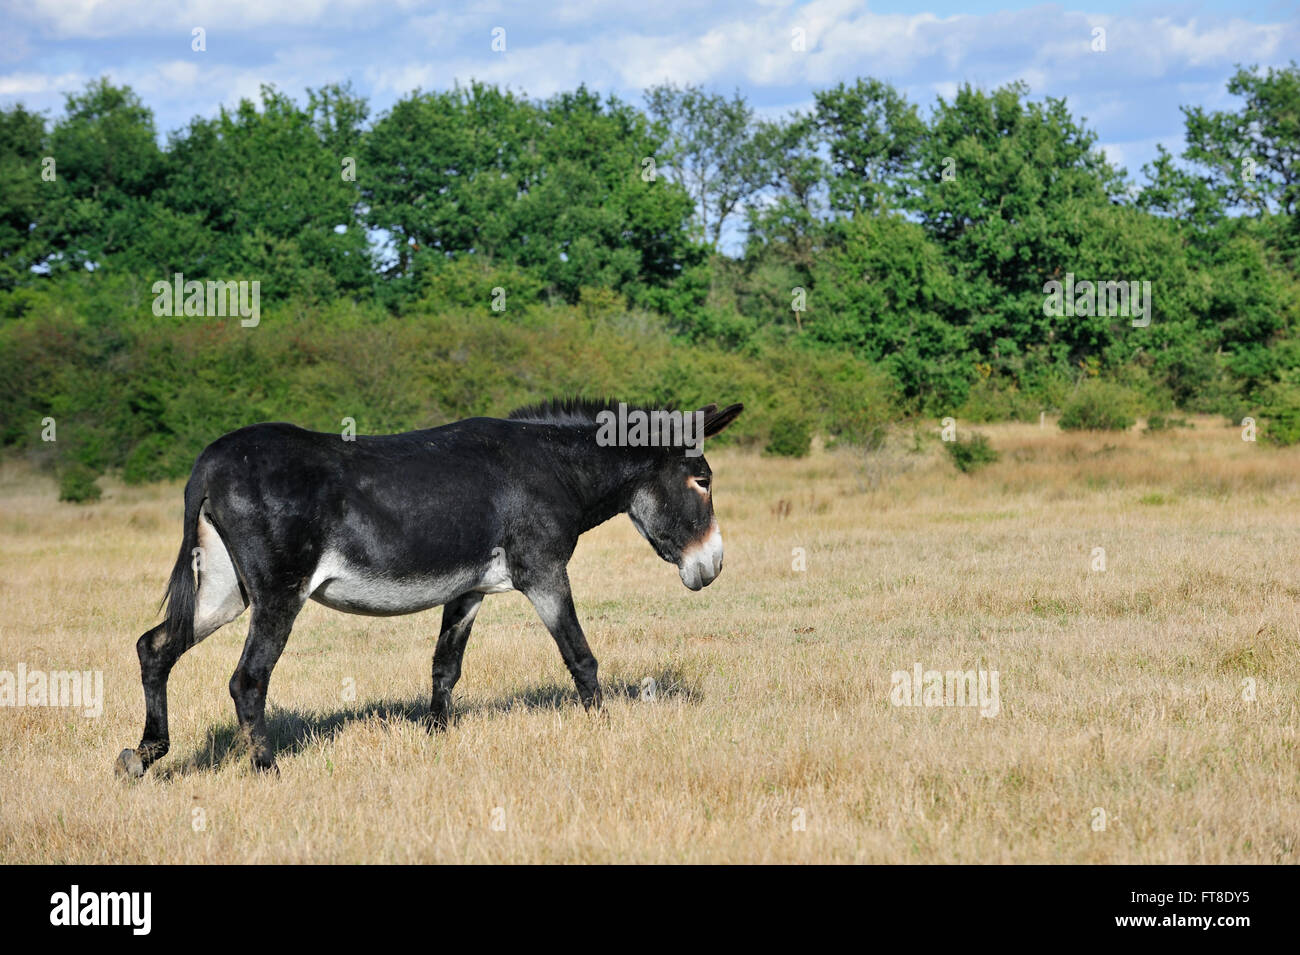 Grand Noir du Berry donkey (Equus asinus) in field, La Brenne, France Stock Photo